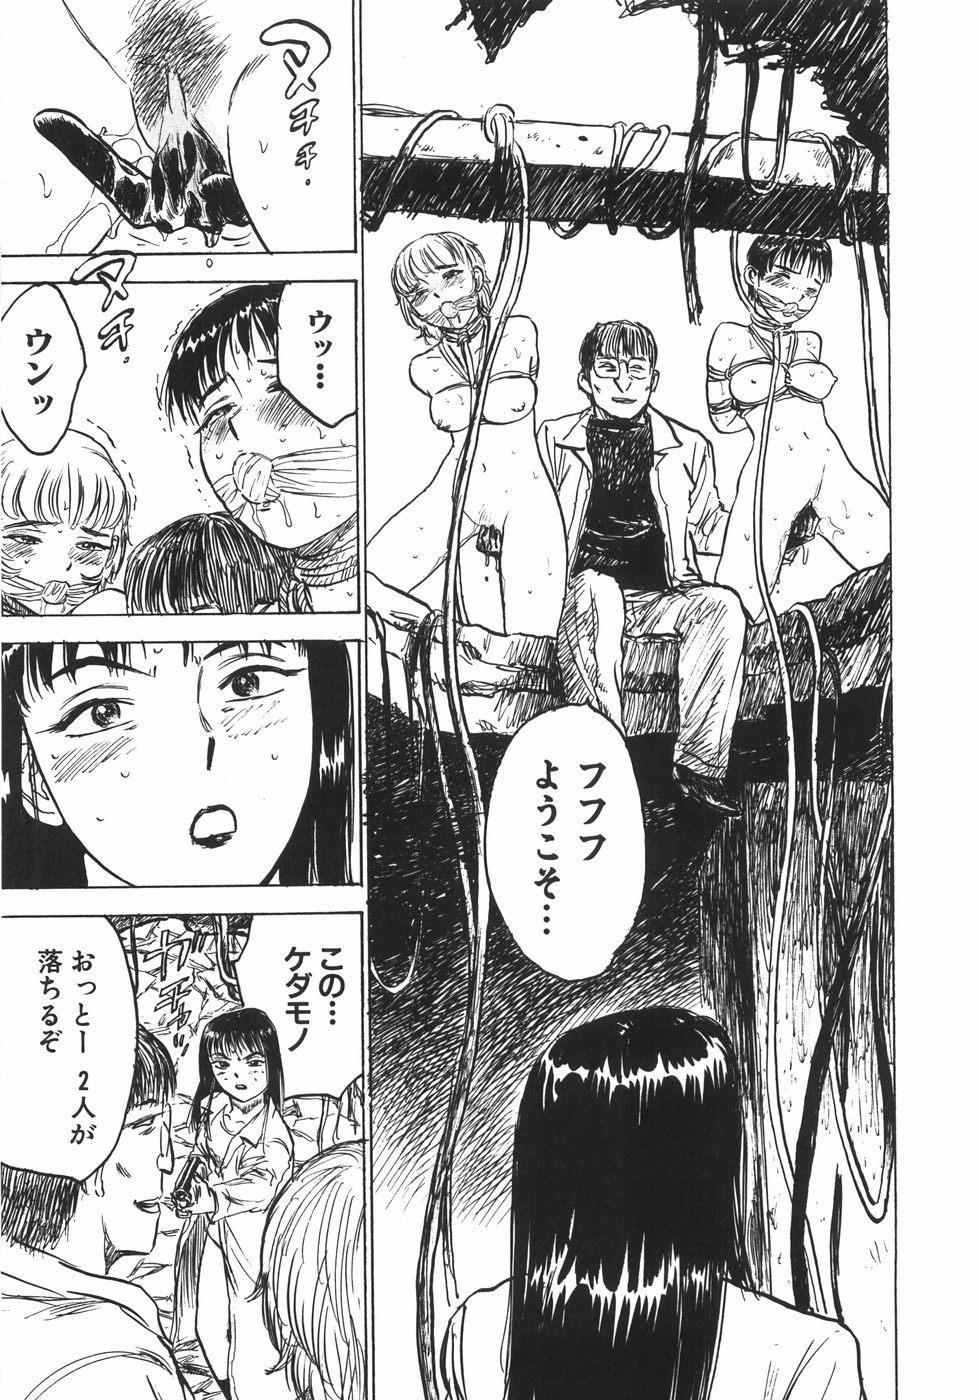 Ningyou no Yakata - The Doll House 131